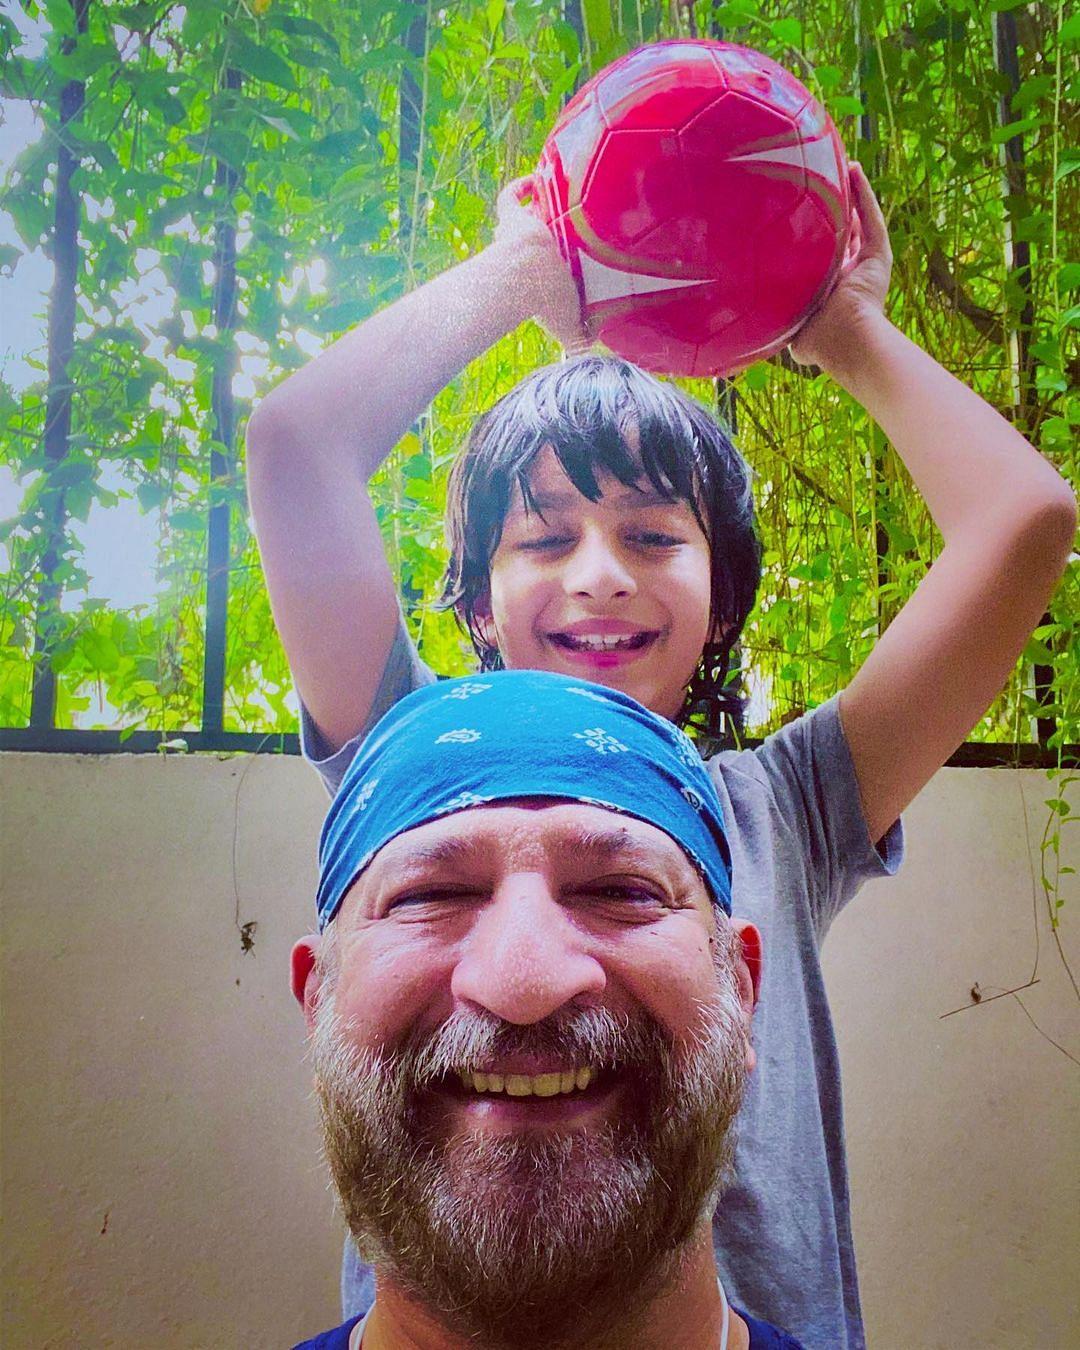 In Pics: Raj Kaushal's doting dad moments with son Vir and daughter Tara